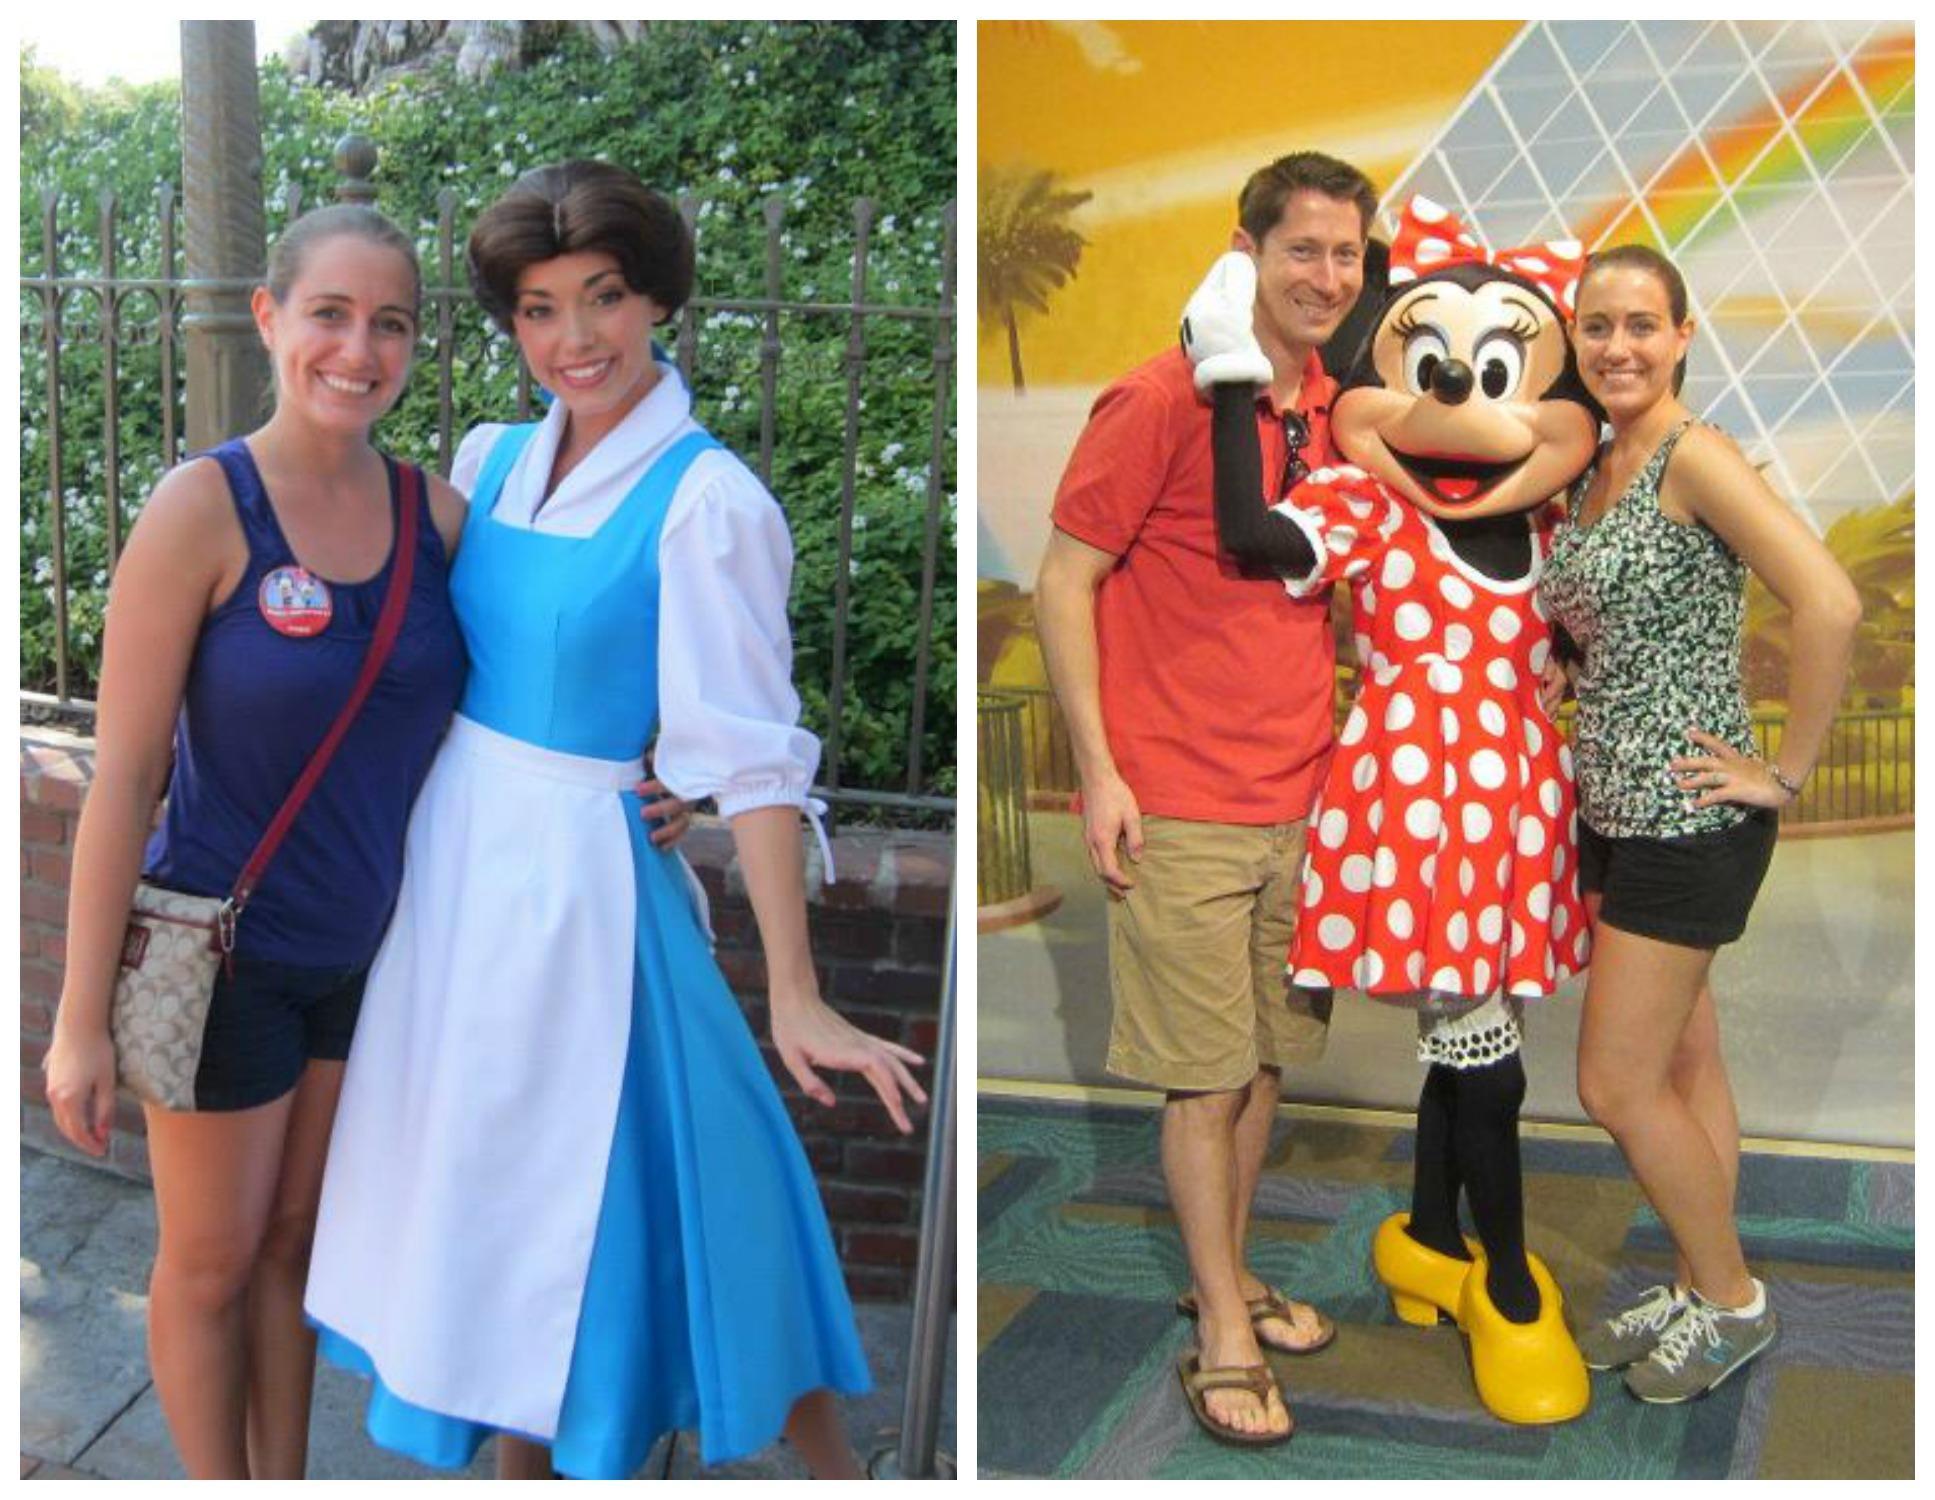 Disney World Belle 2014 With Belle at Disneyland inDisney World Belle 2014